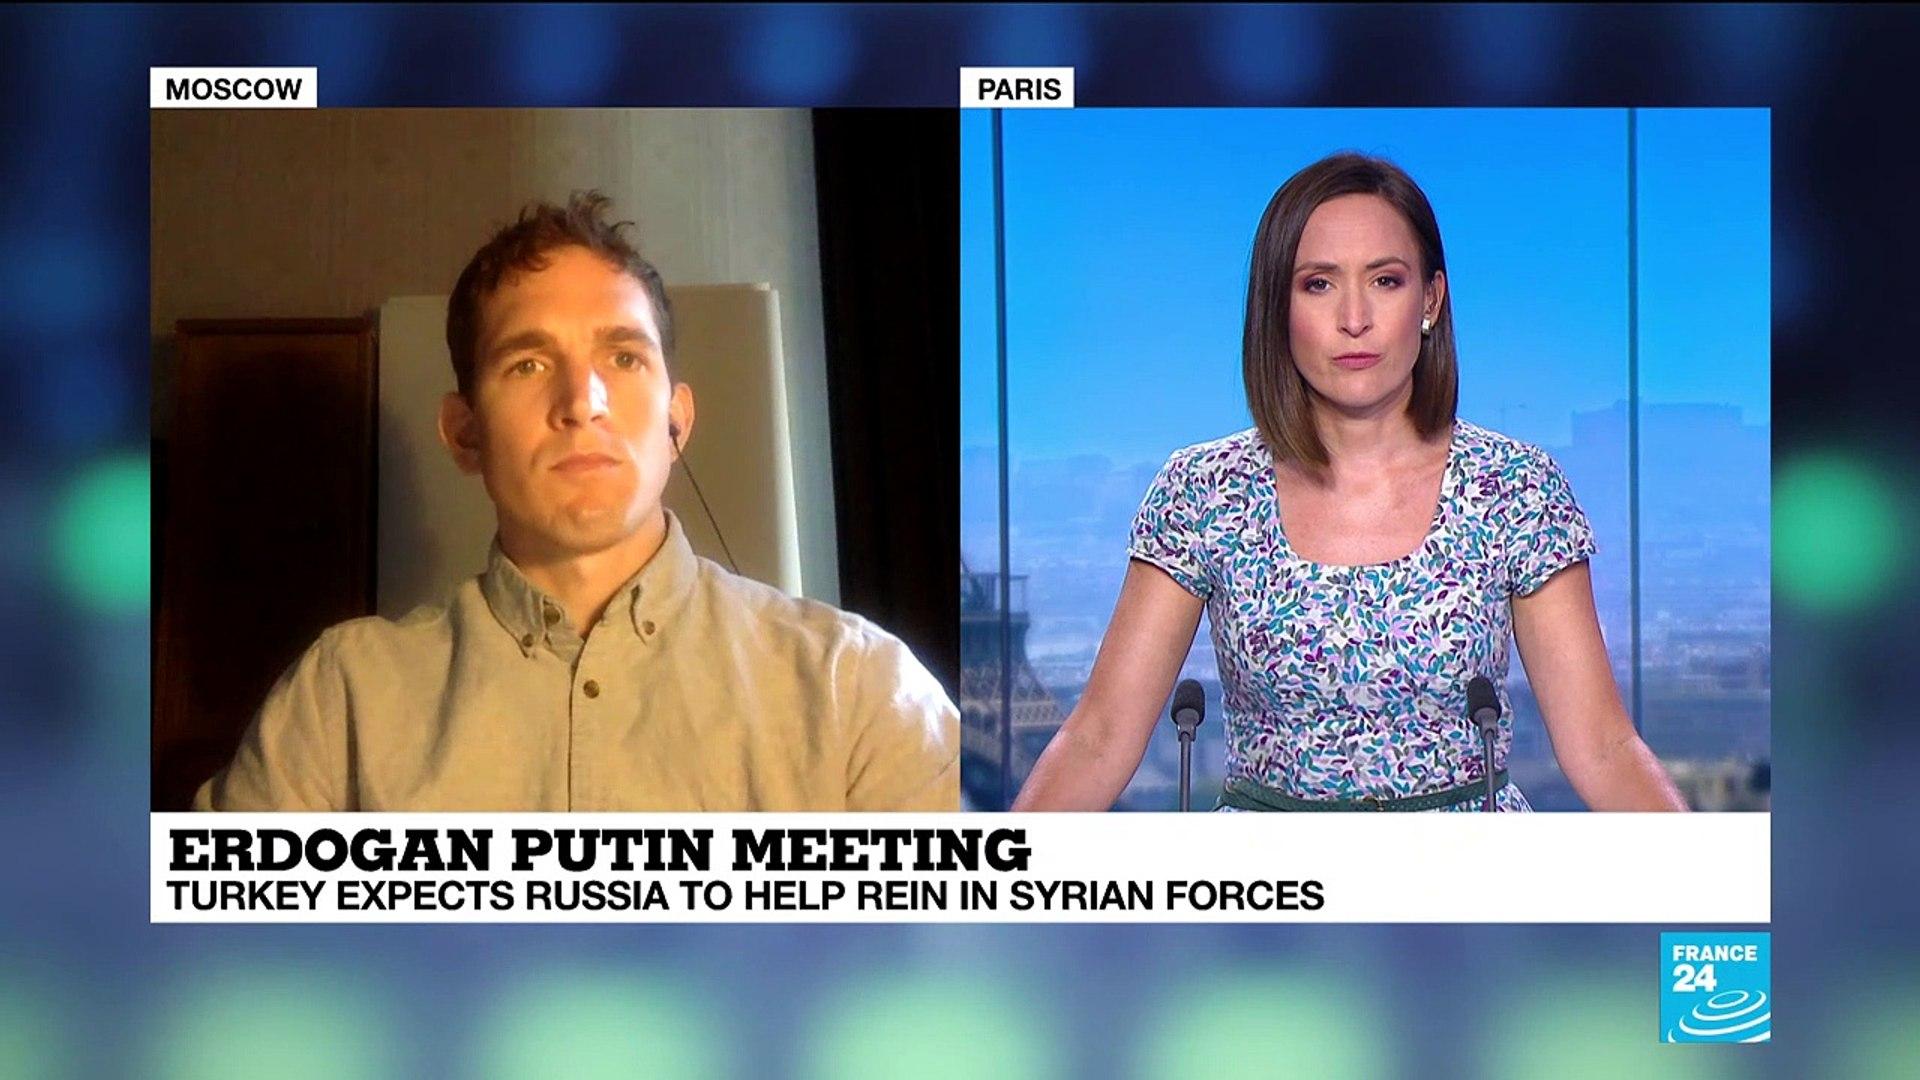 Russia: Turkish president Recep Tayyip Erdogan meets Vladimir Putin amid tensions in Syria's Id